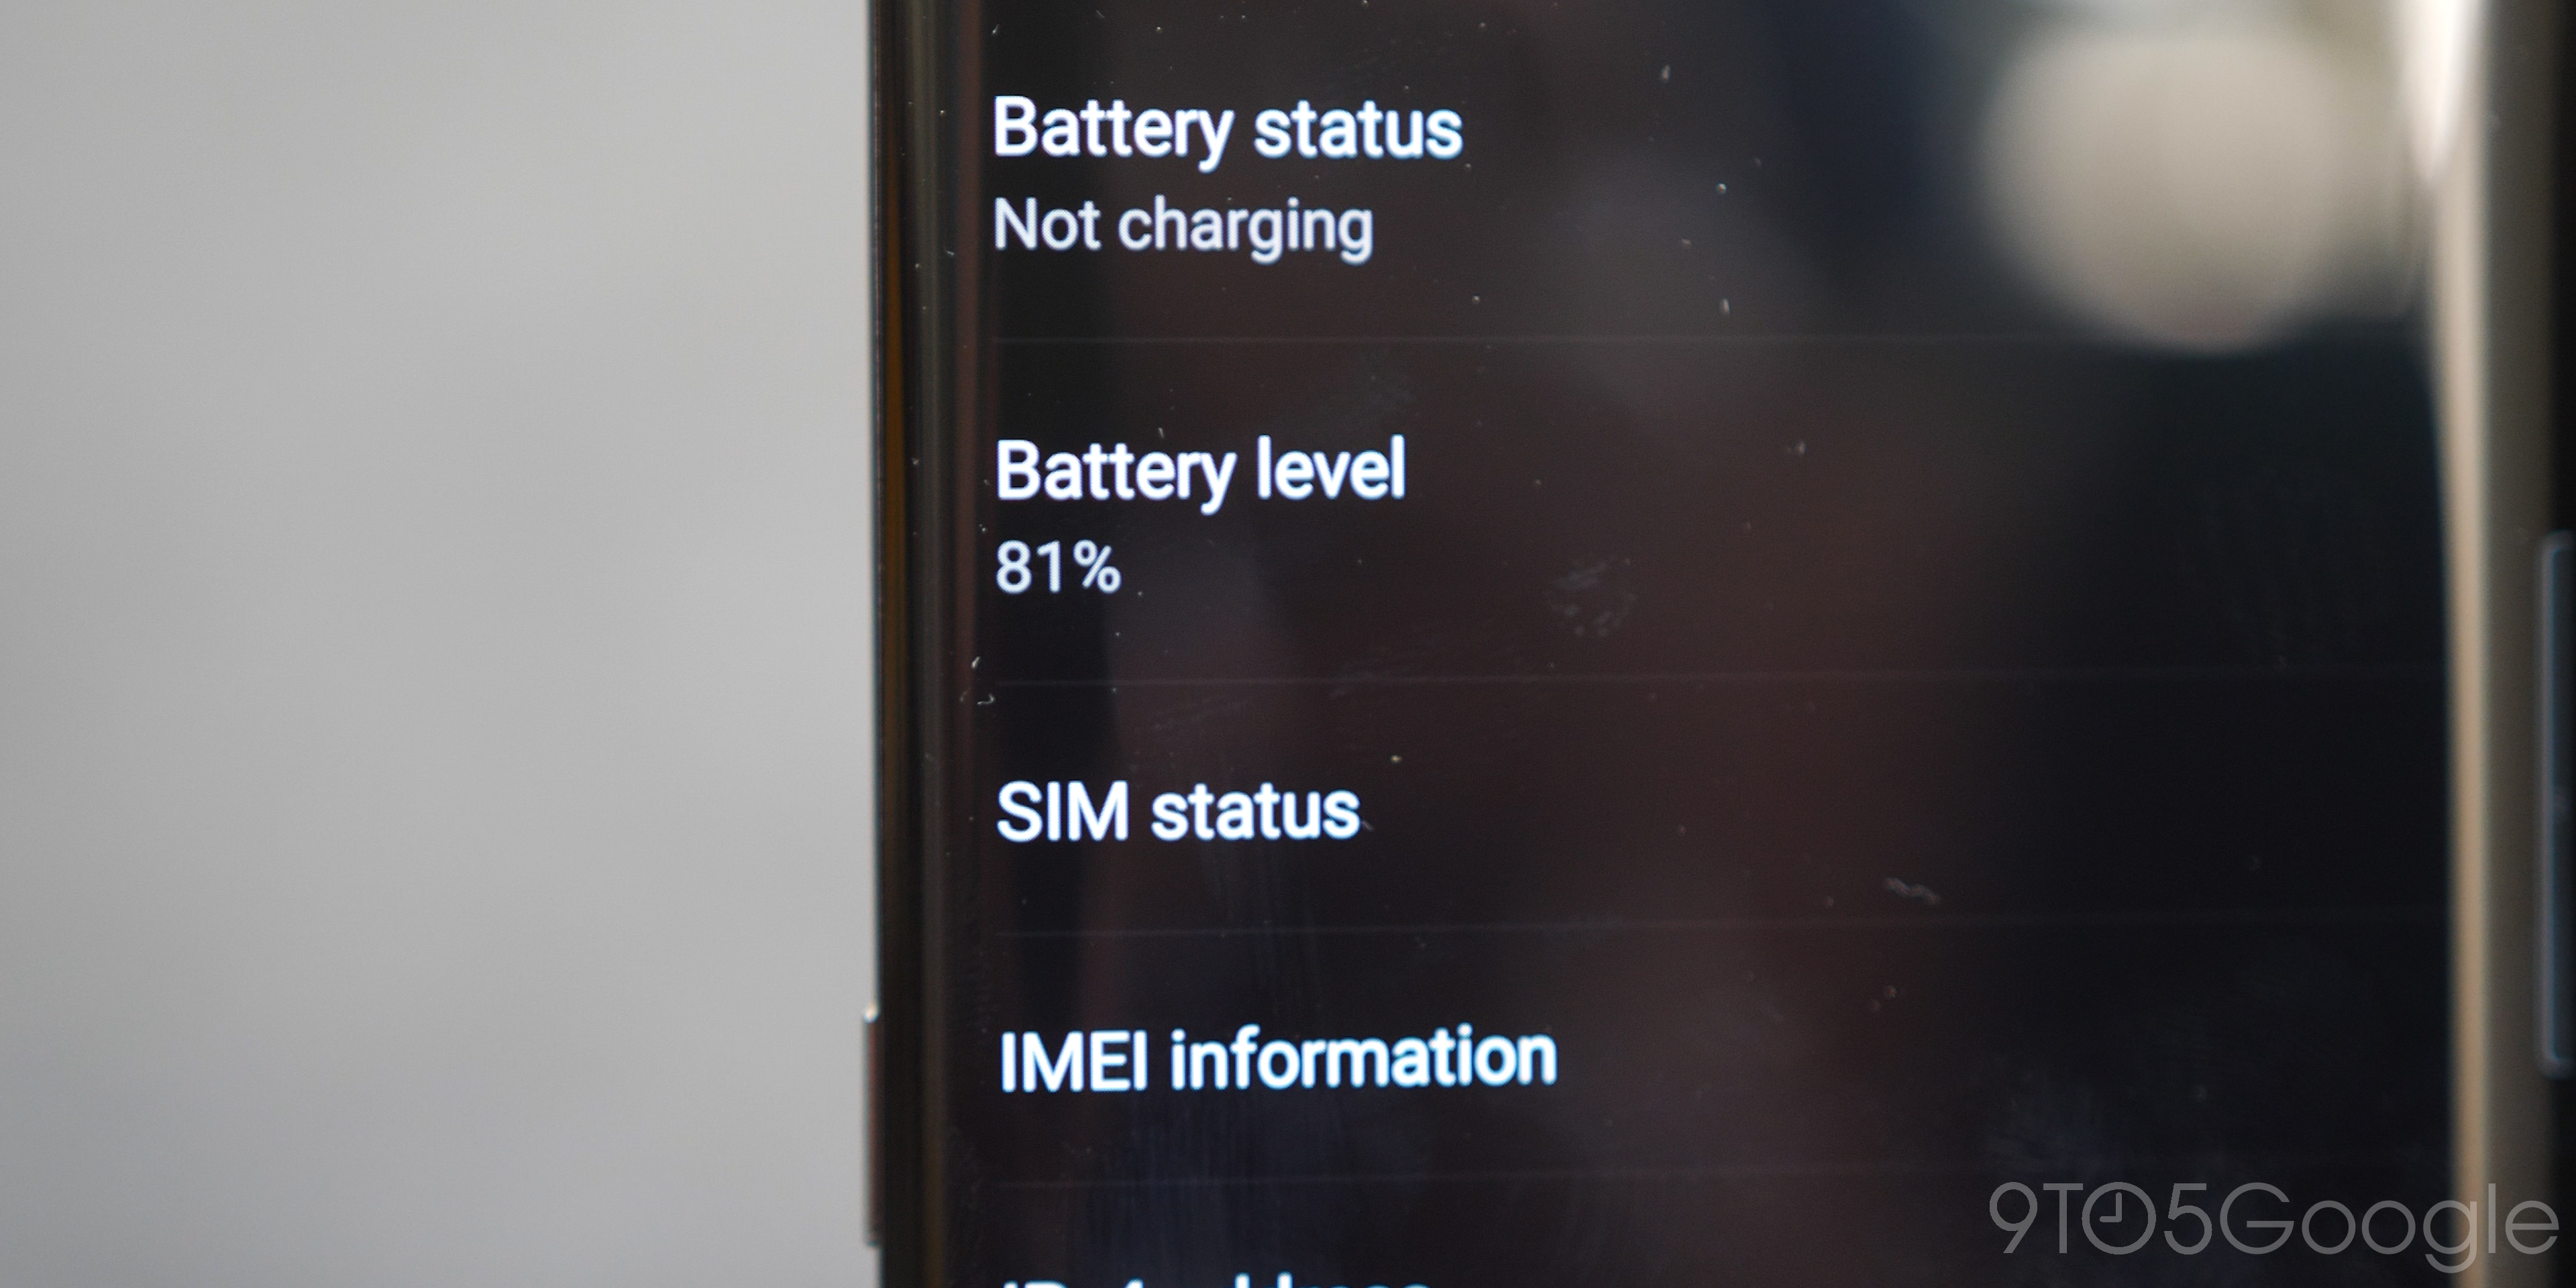 tcl 10 pro battery